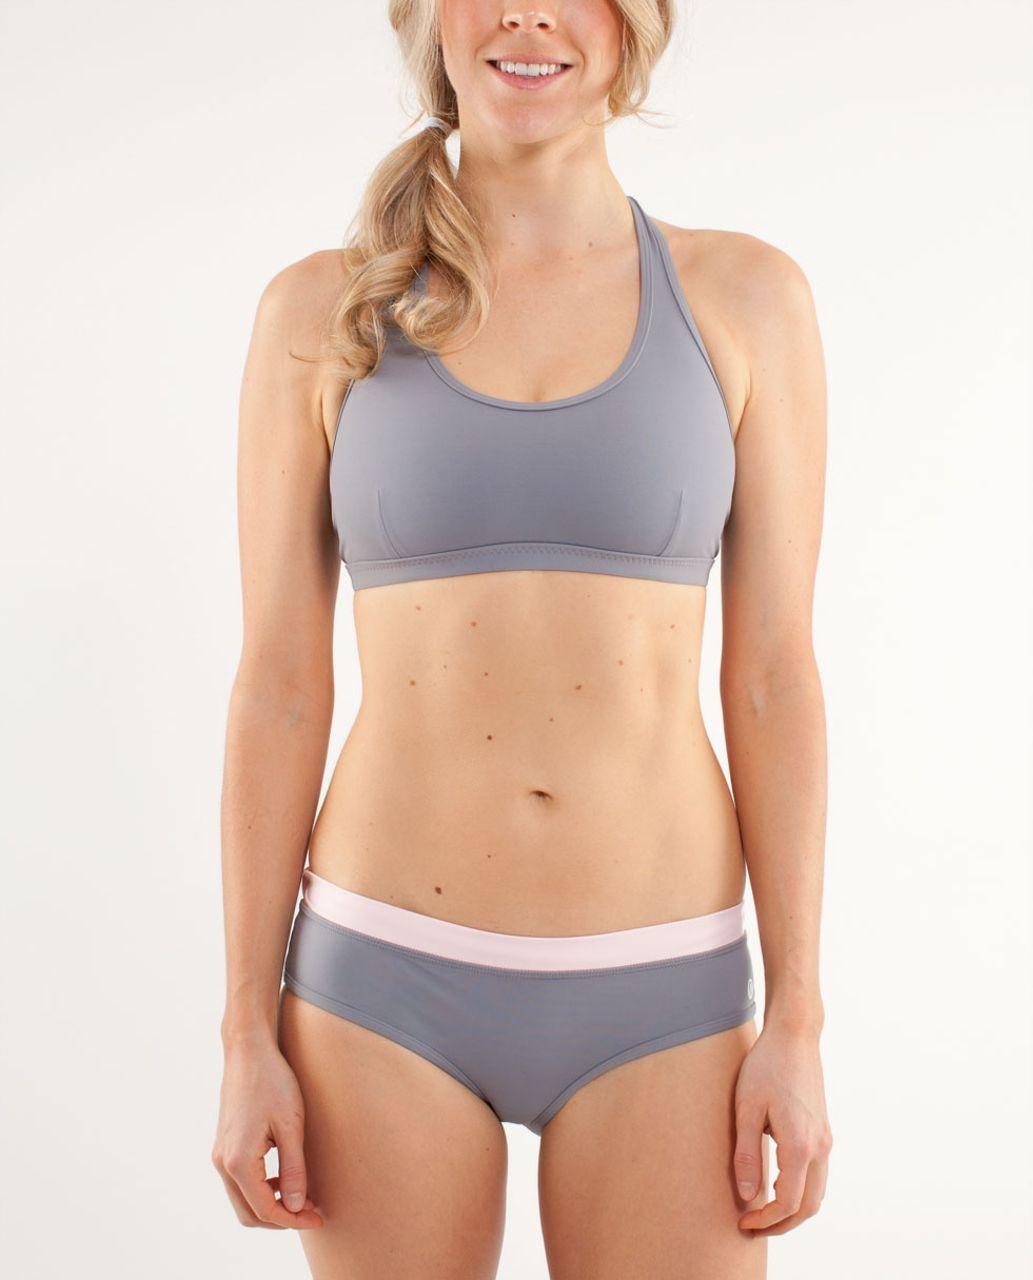 Lululemon Heatwave Swim Racer Top - Fossil /  Wee Stripe White Blush Quartz